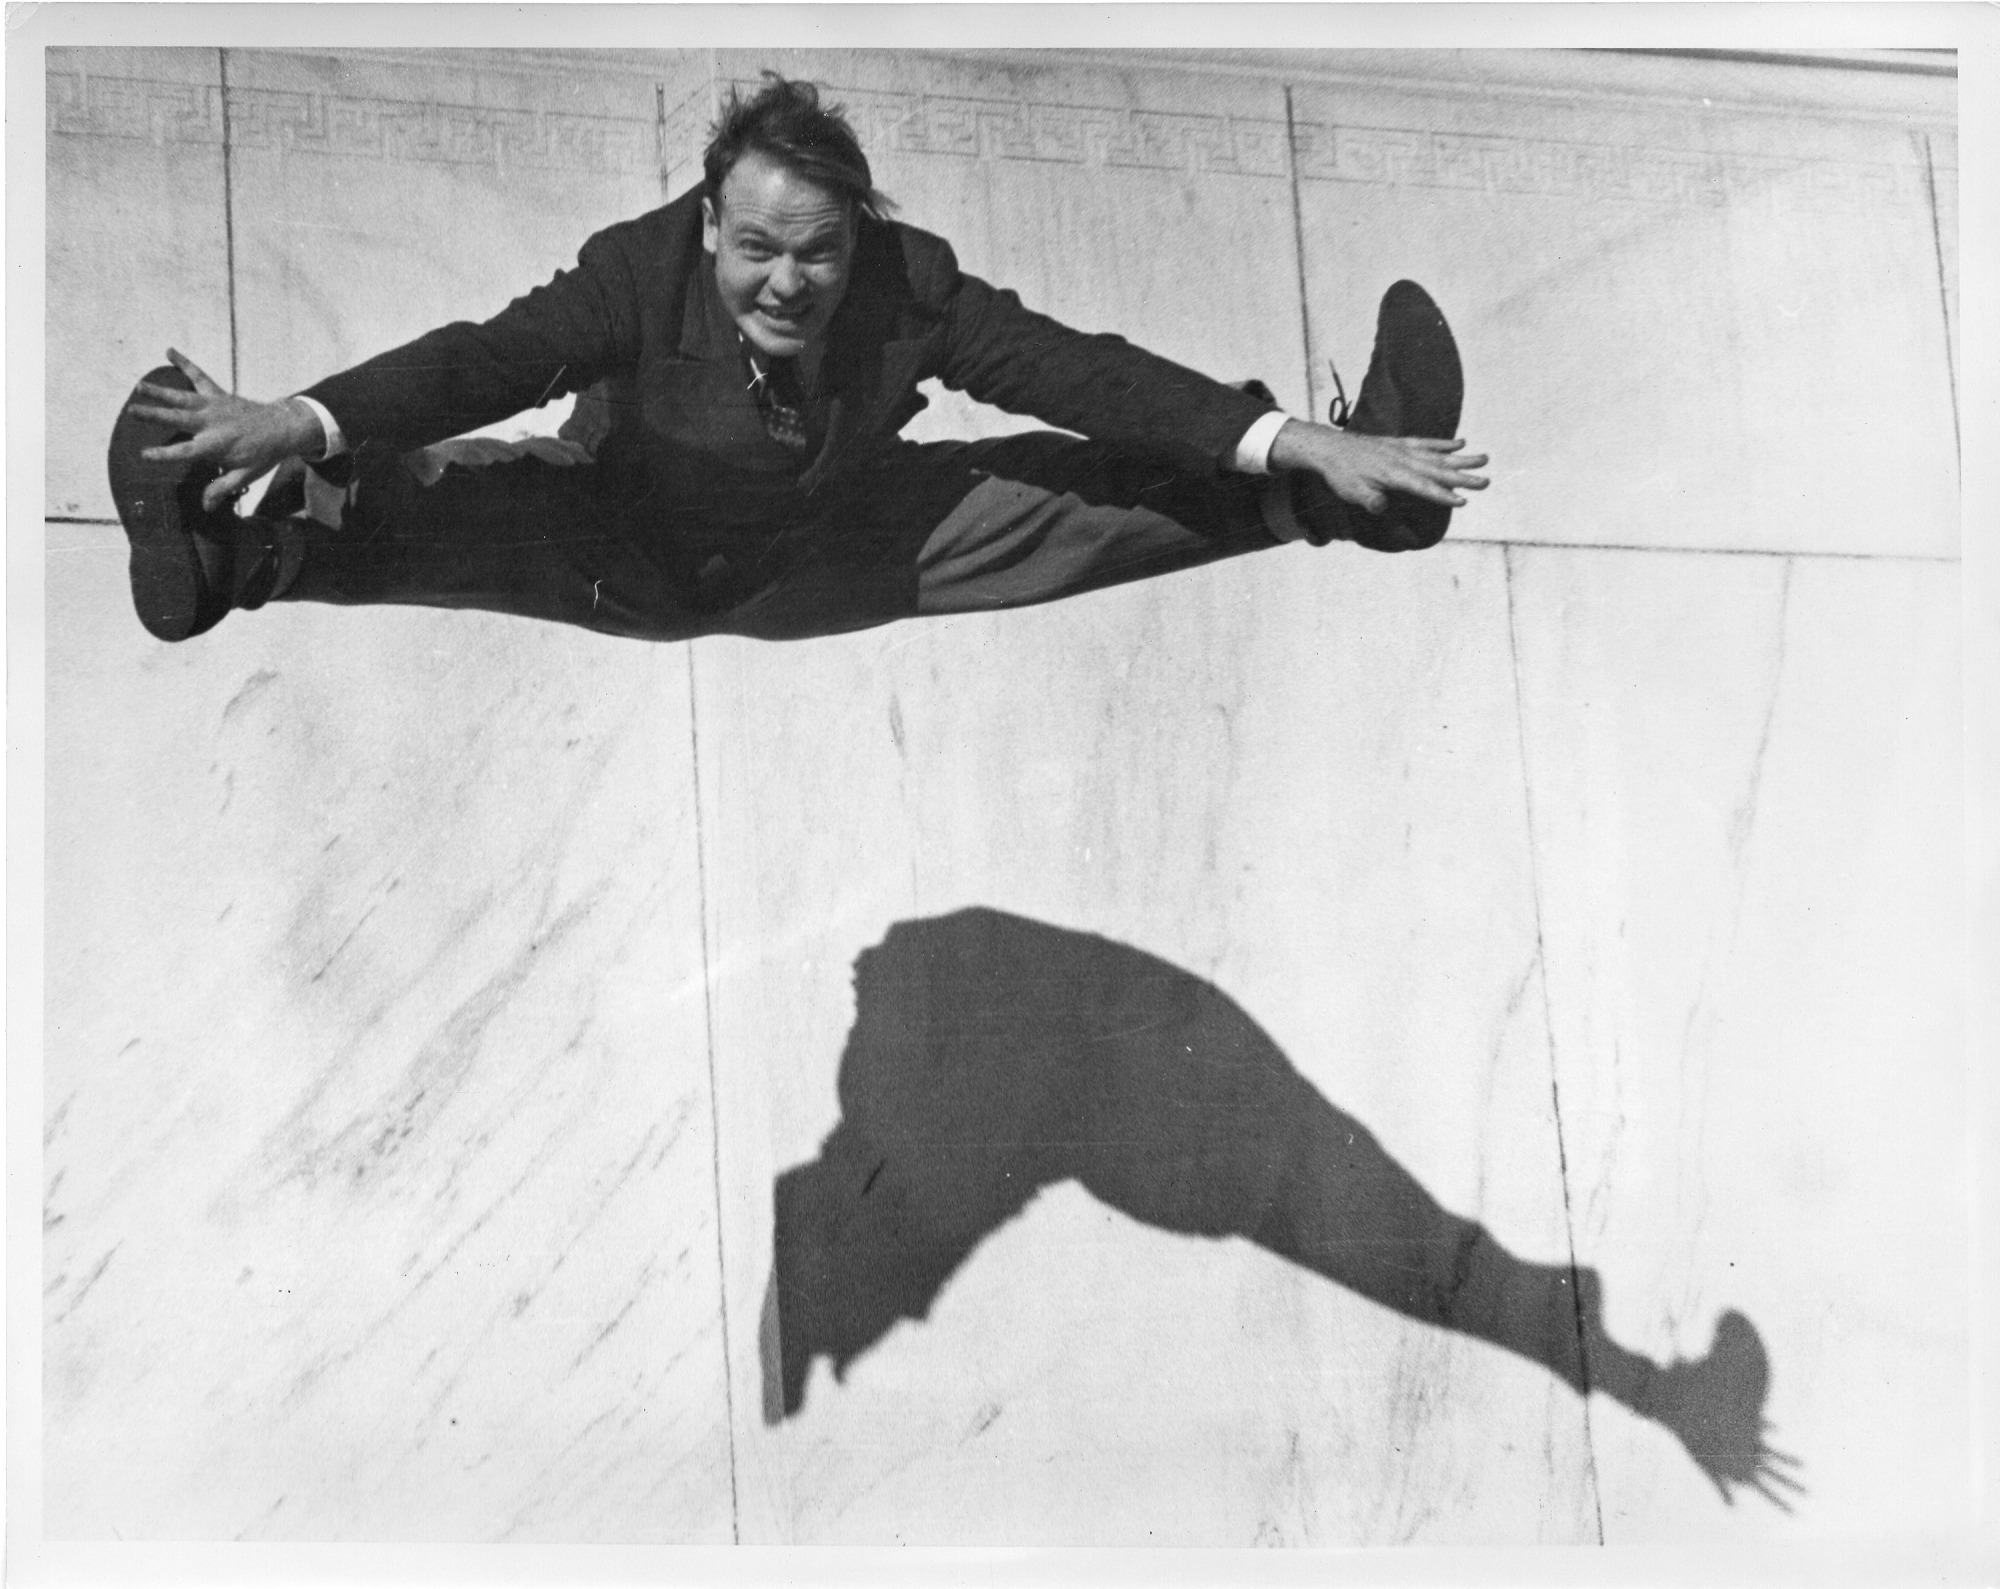 Fremont Davis (1915-1977), Smithsonian Institution Archives, SIA Acc. 90-105 [SIA2008-0887].